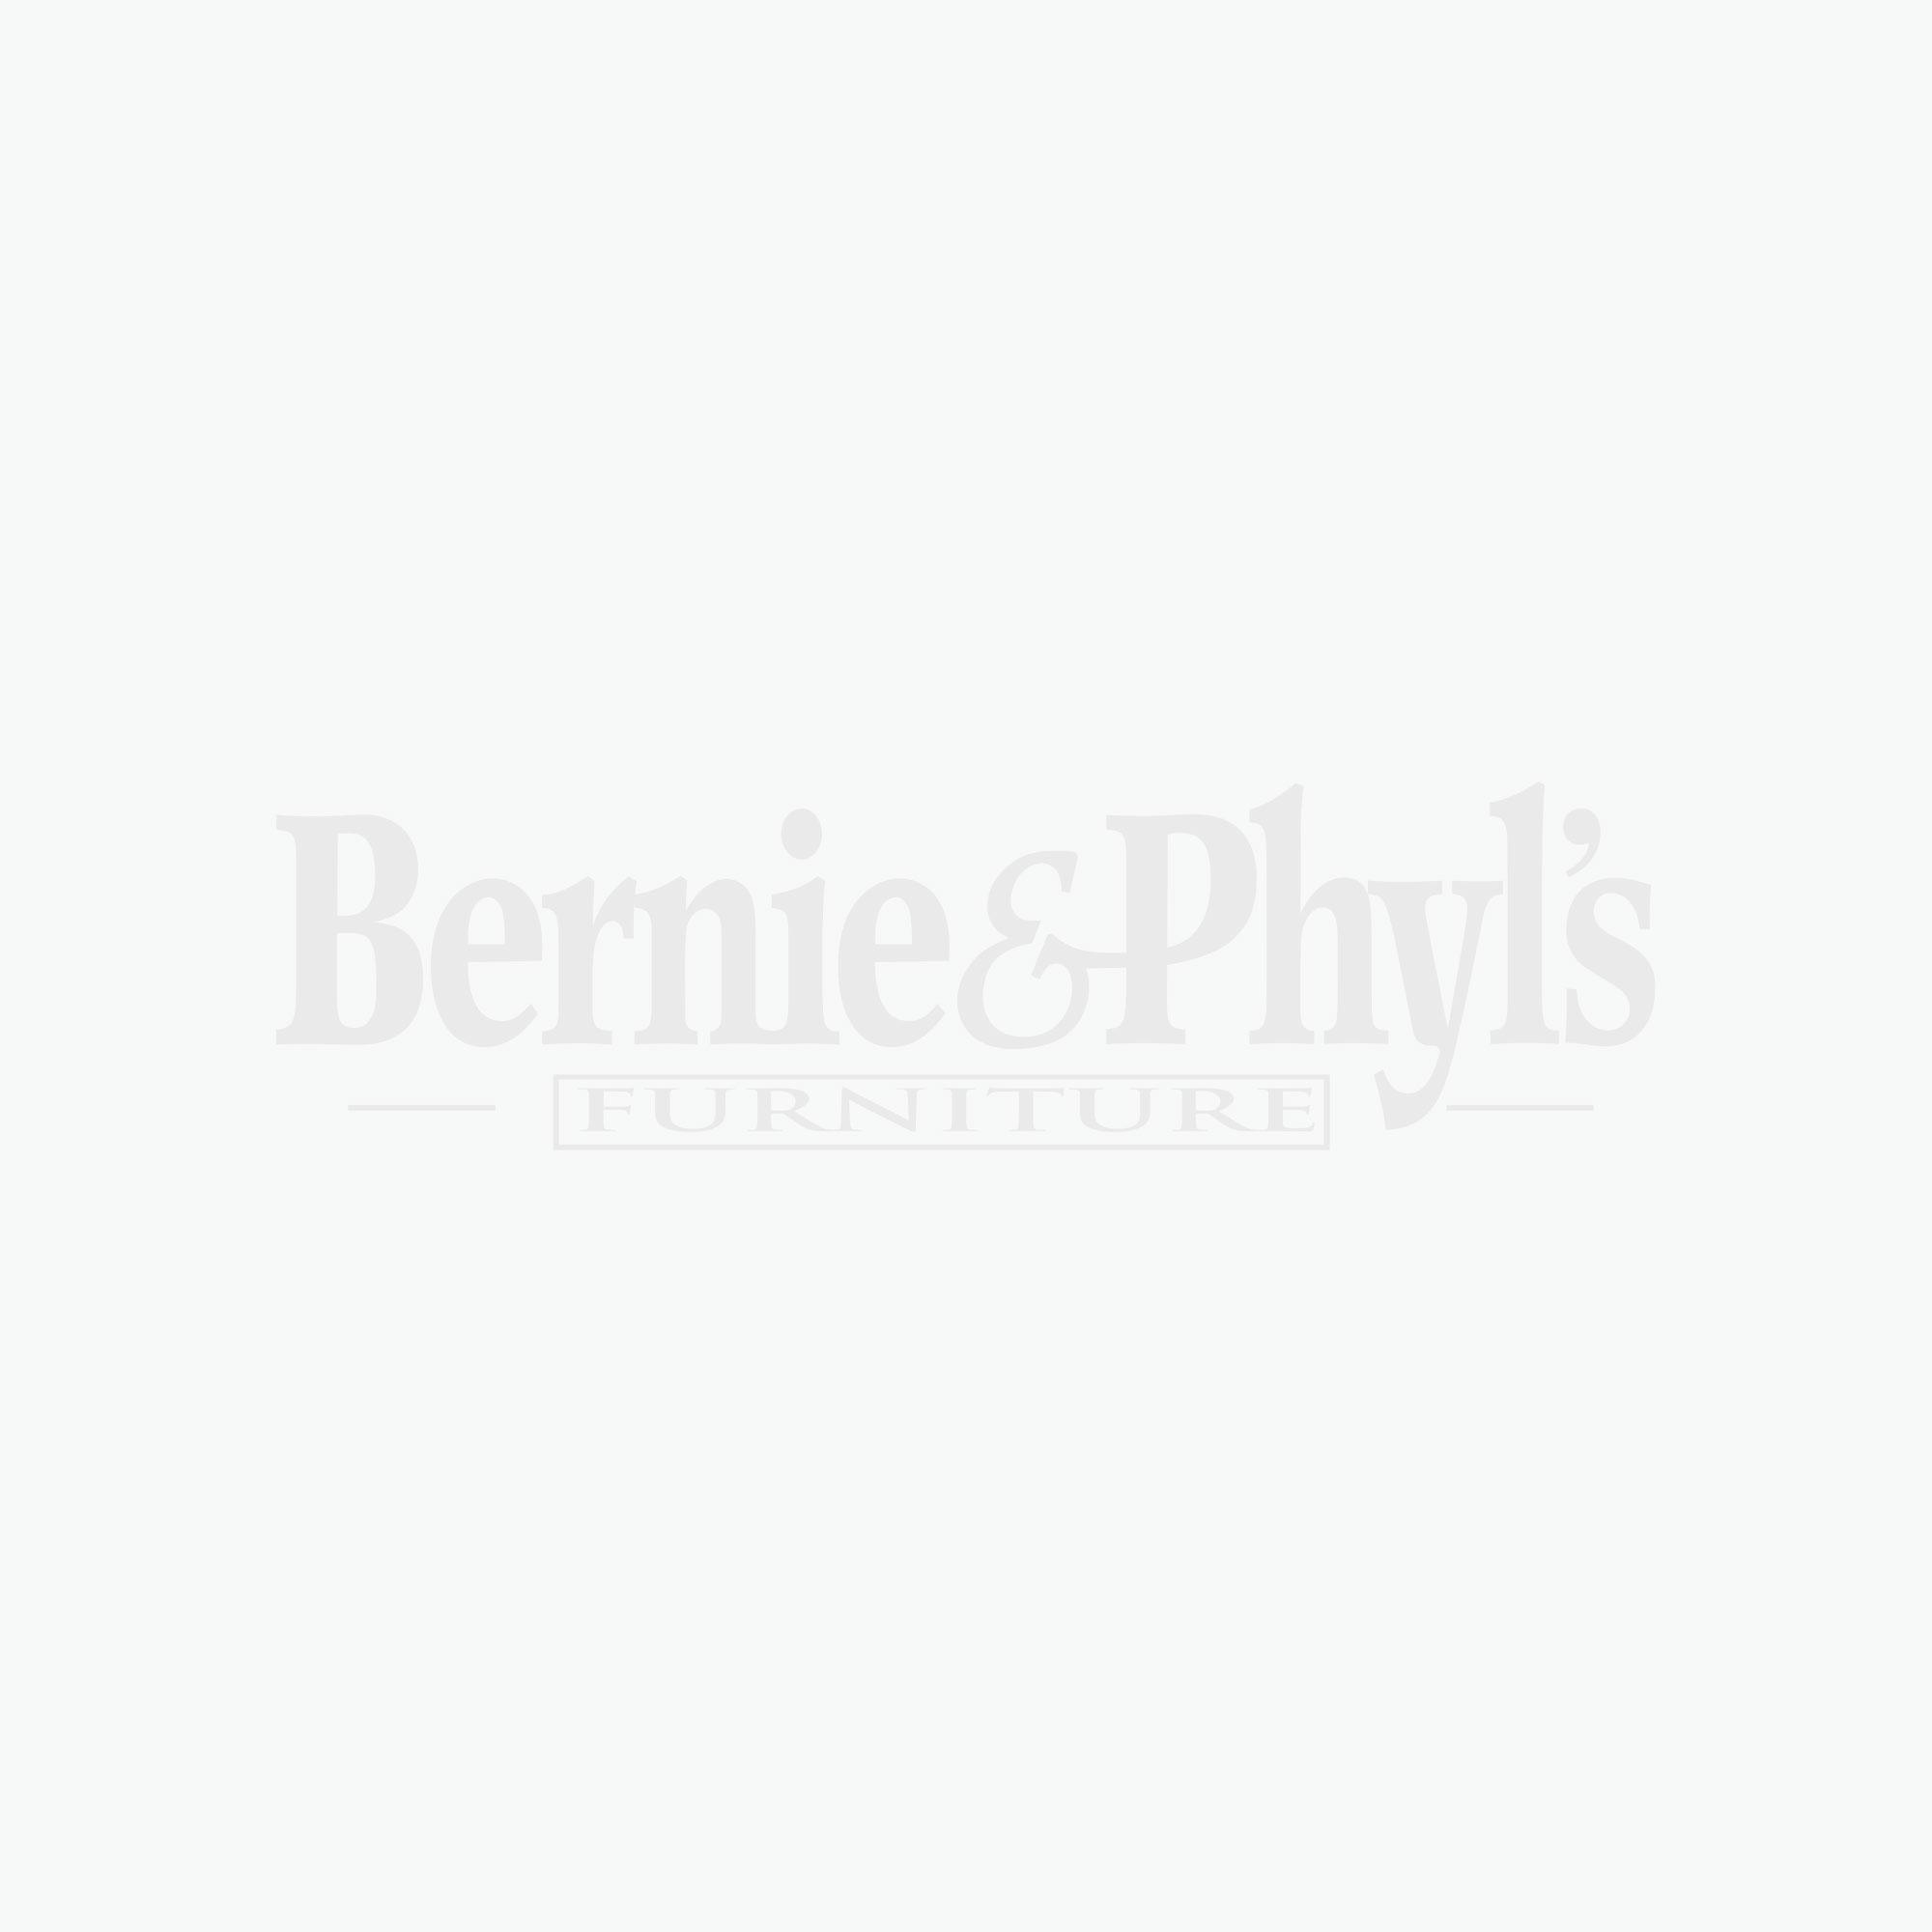 port townsend buffet bernie phyl s furniture by a